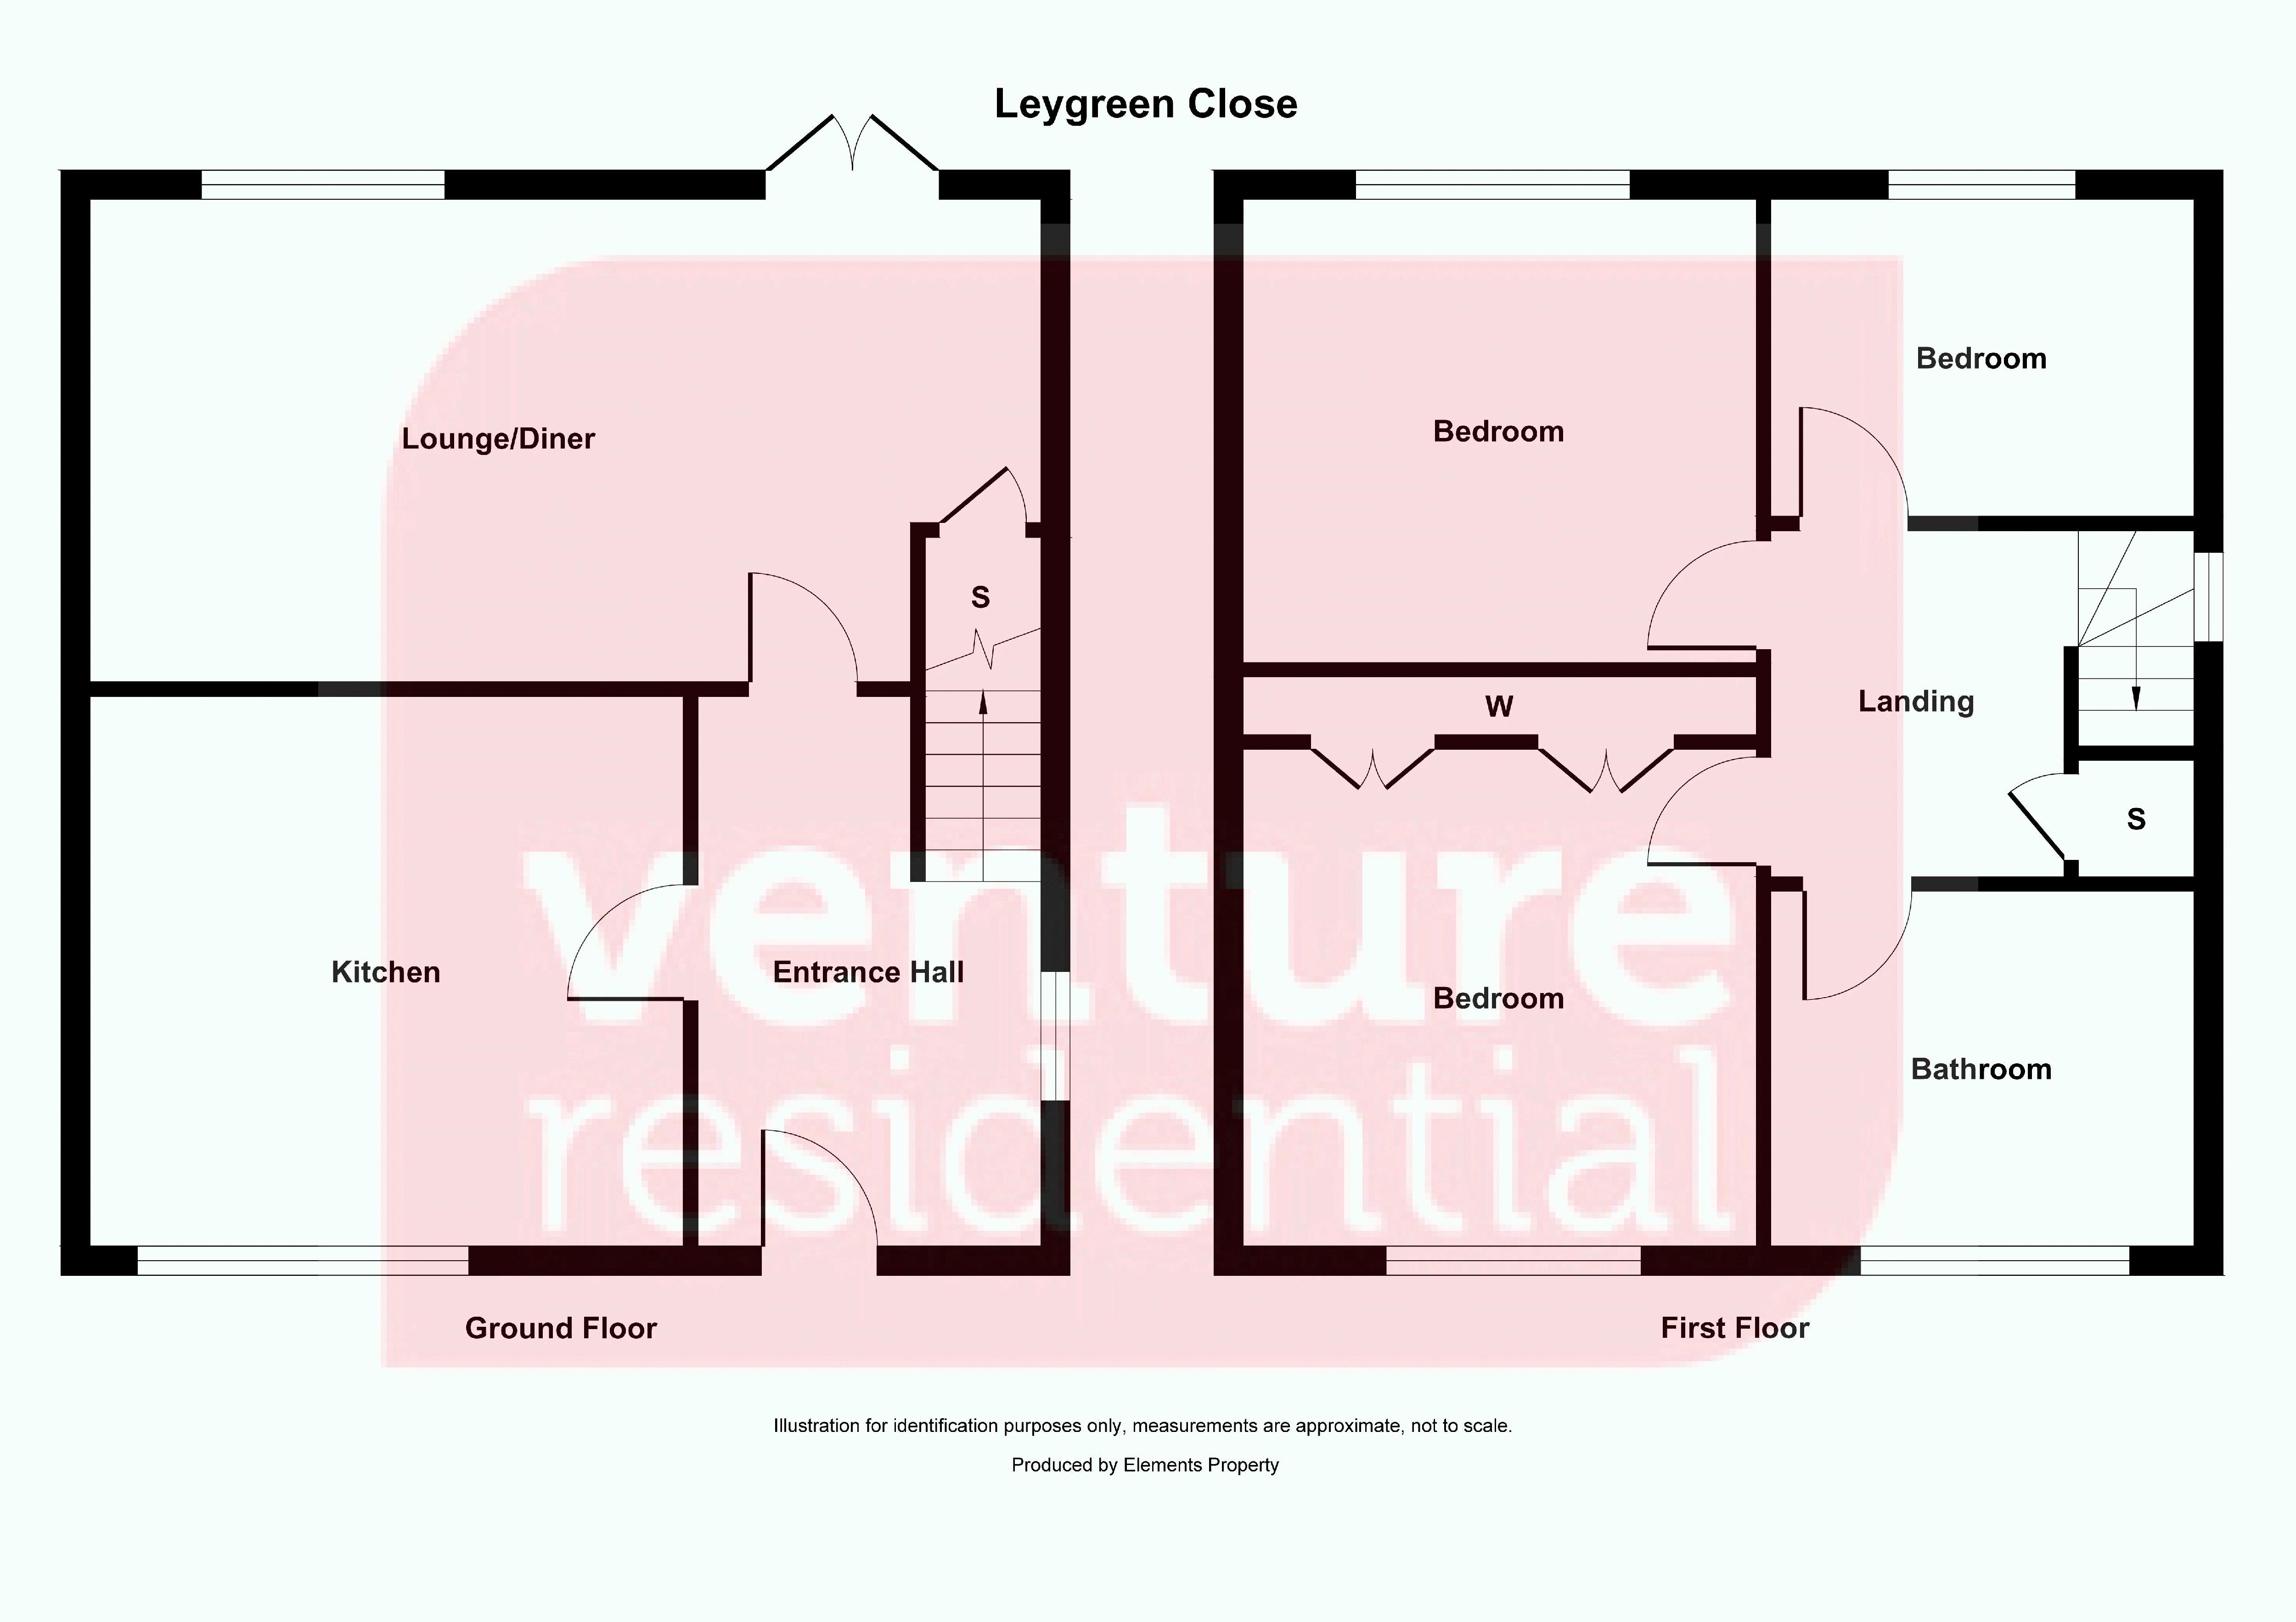 Leygreen Close